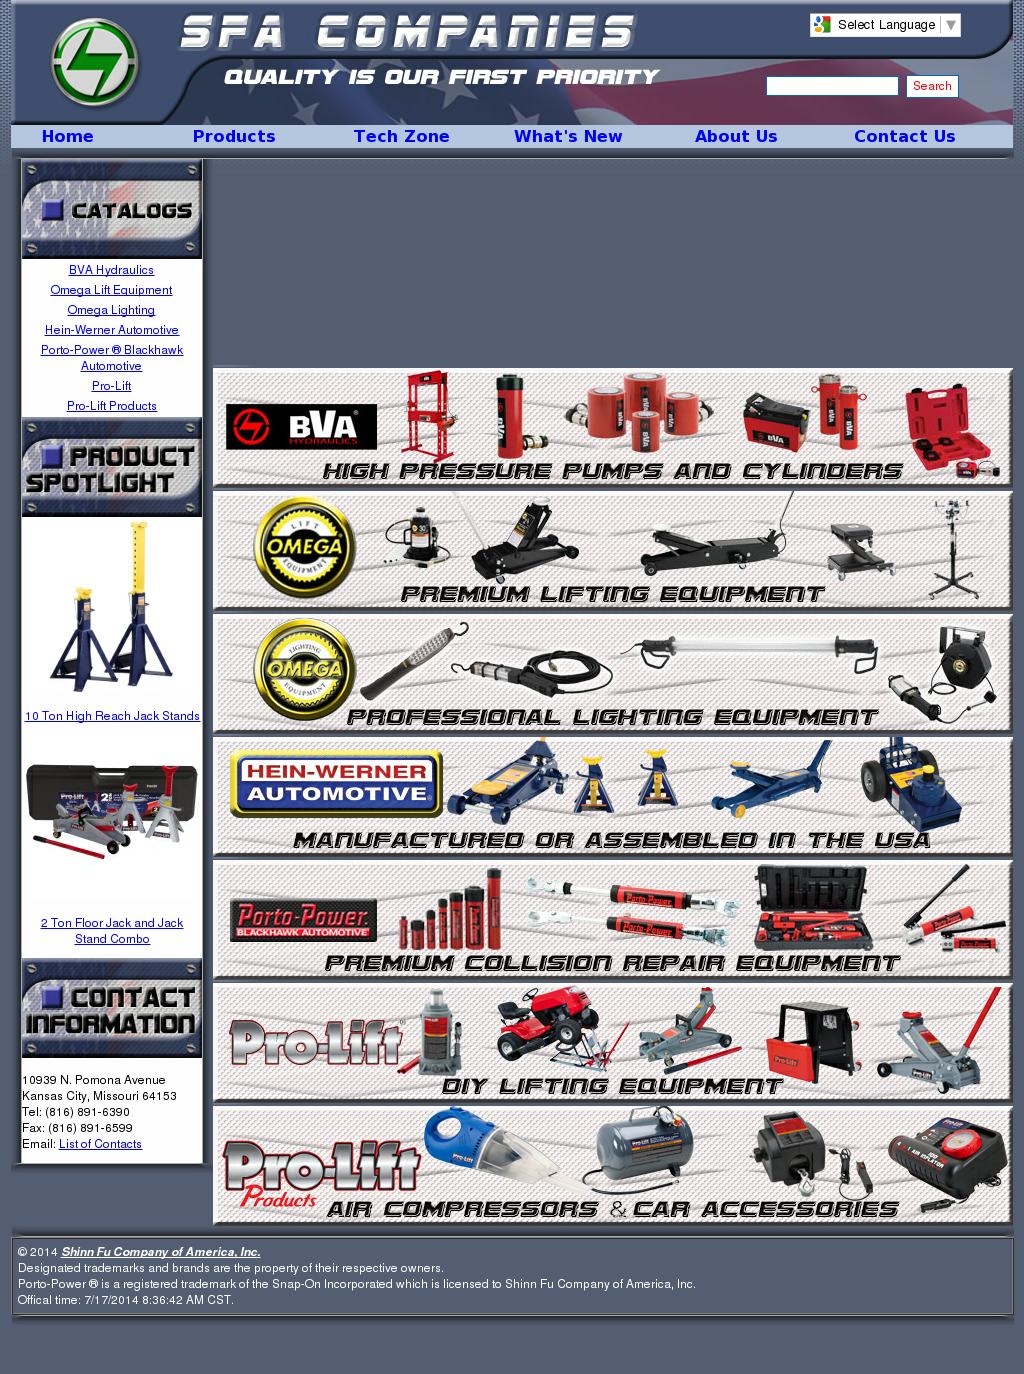 Shinn Fu Company Competitors, Revenue and Employees - Owler